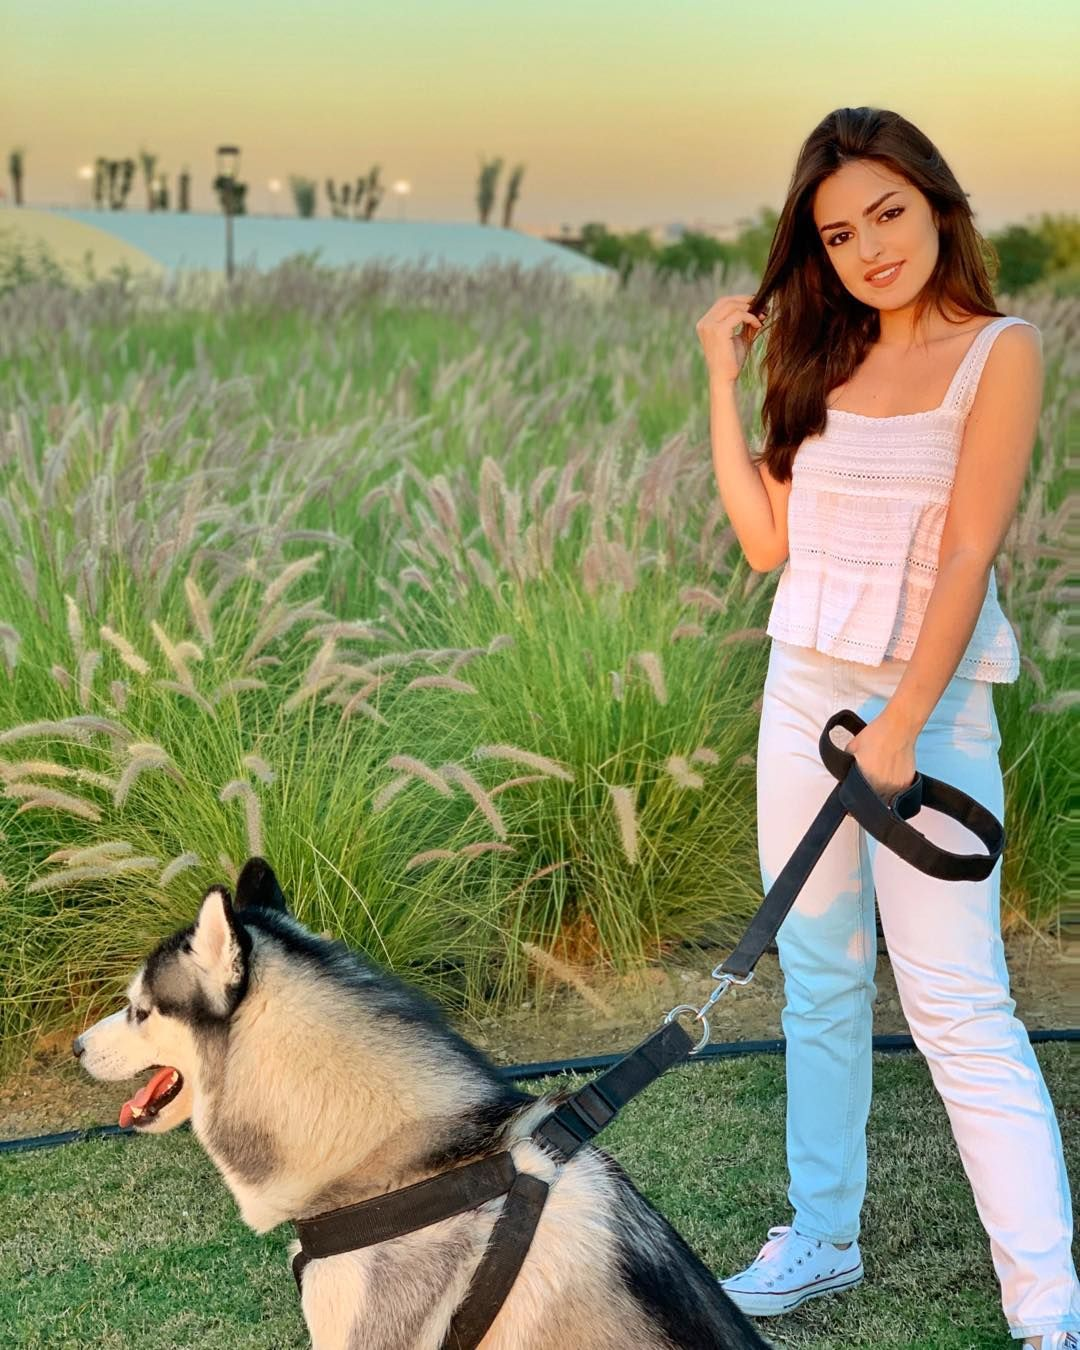 Safa Srour صفا سرور On Instagram سعيدة جدا أني رح زور اهل المملكة و تحديدا اهل الرياض بعد يومين صبايا شوفو الستوريز لان في اخبار Animals Dogs Travel